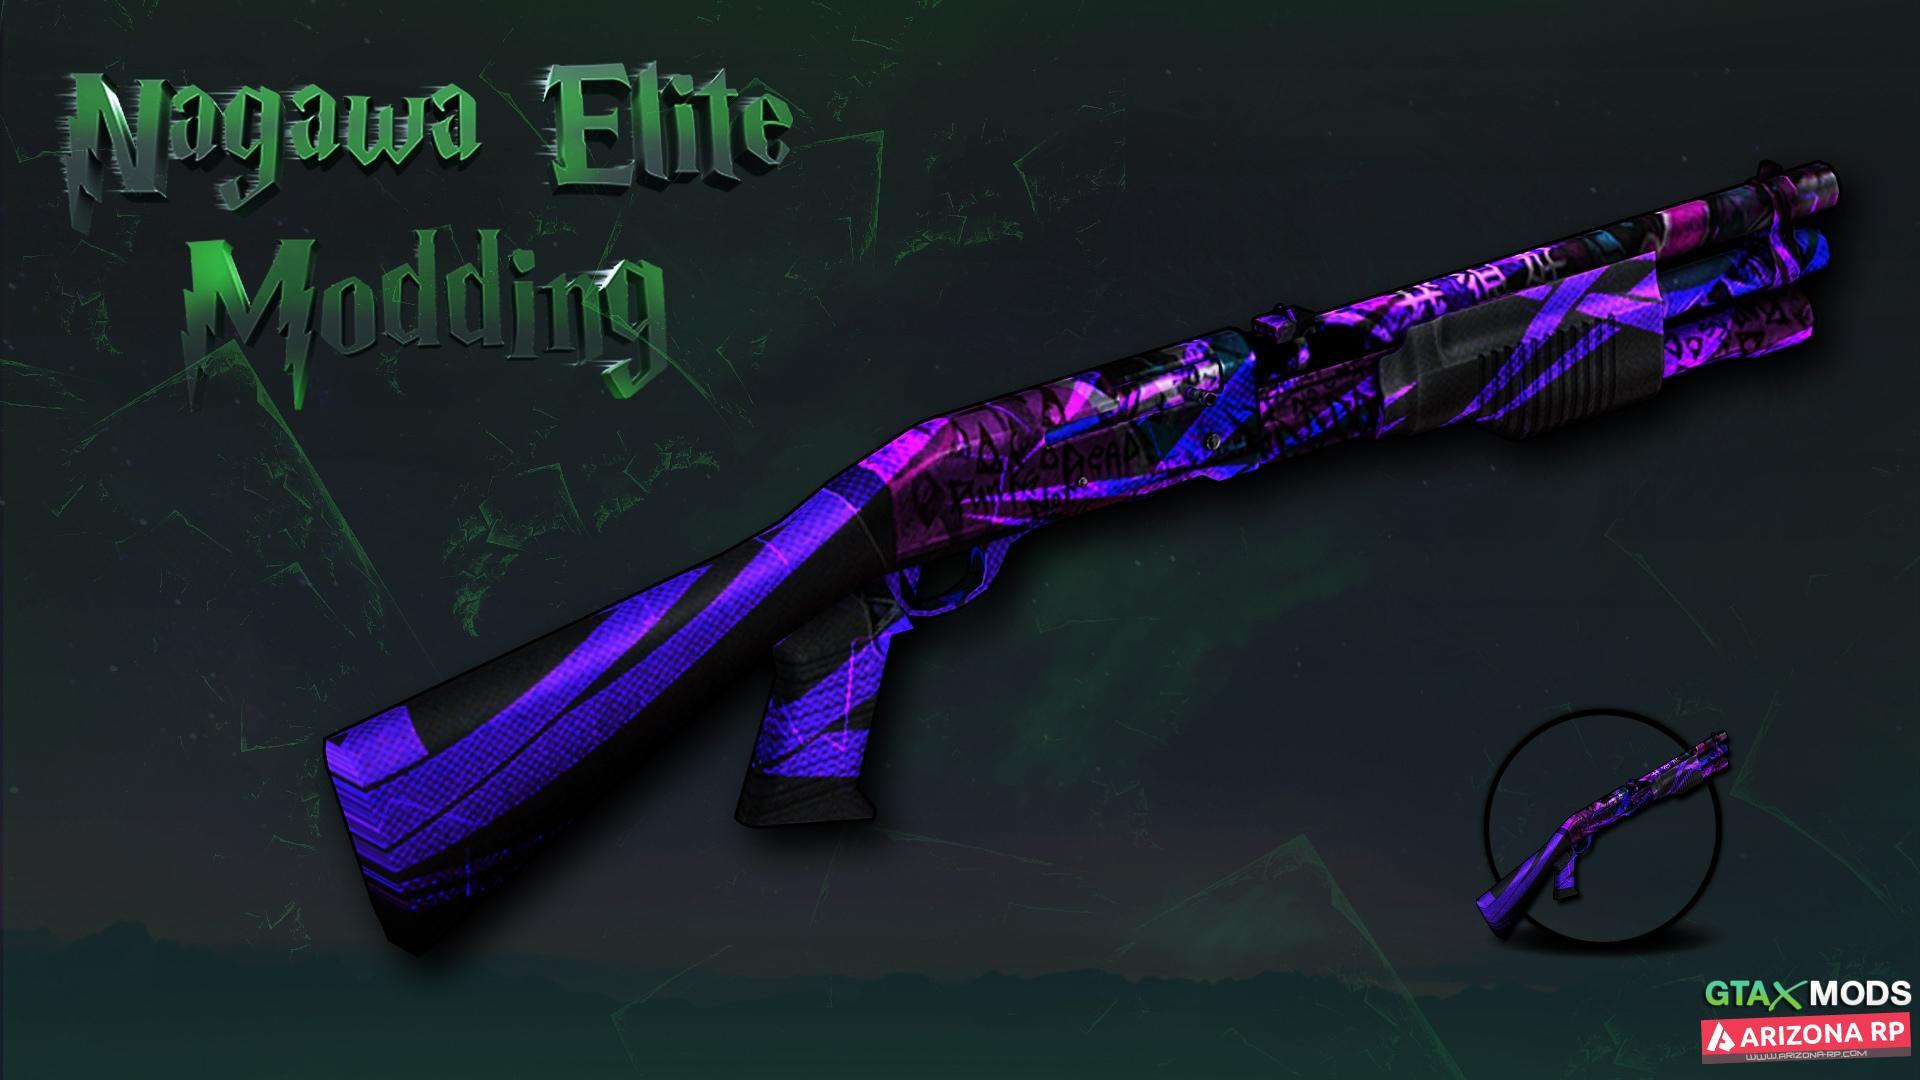 Shotgun | Riot | Nagawa Elite Modding